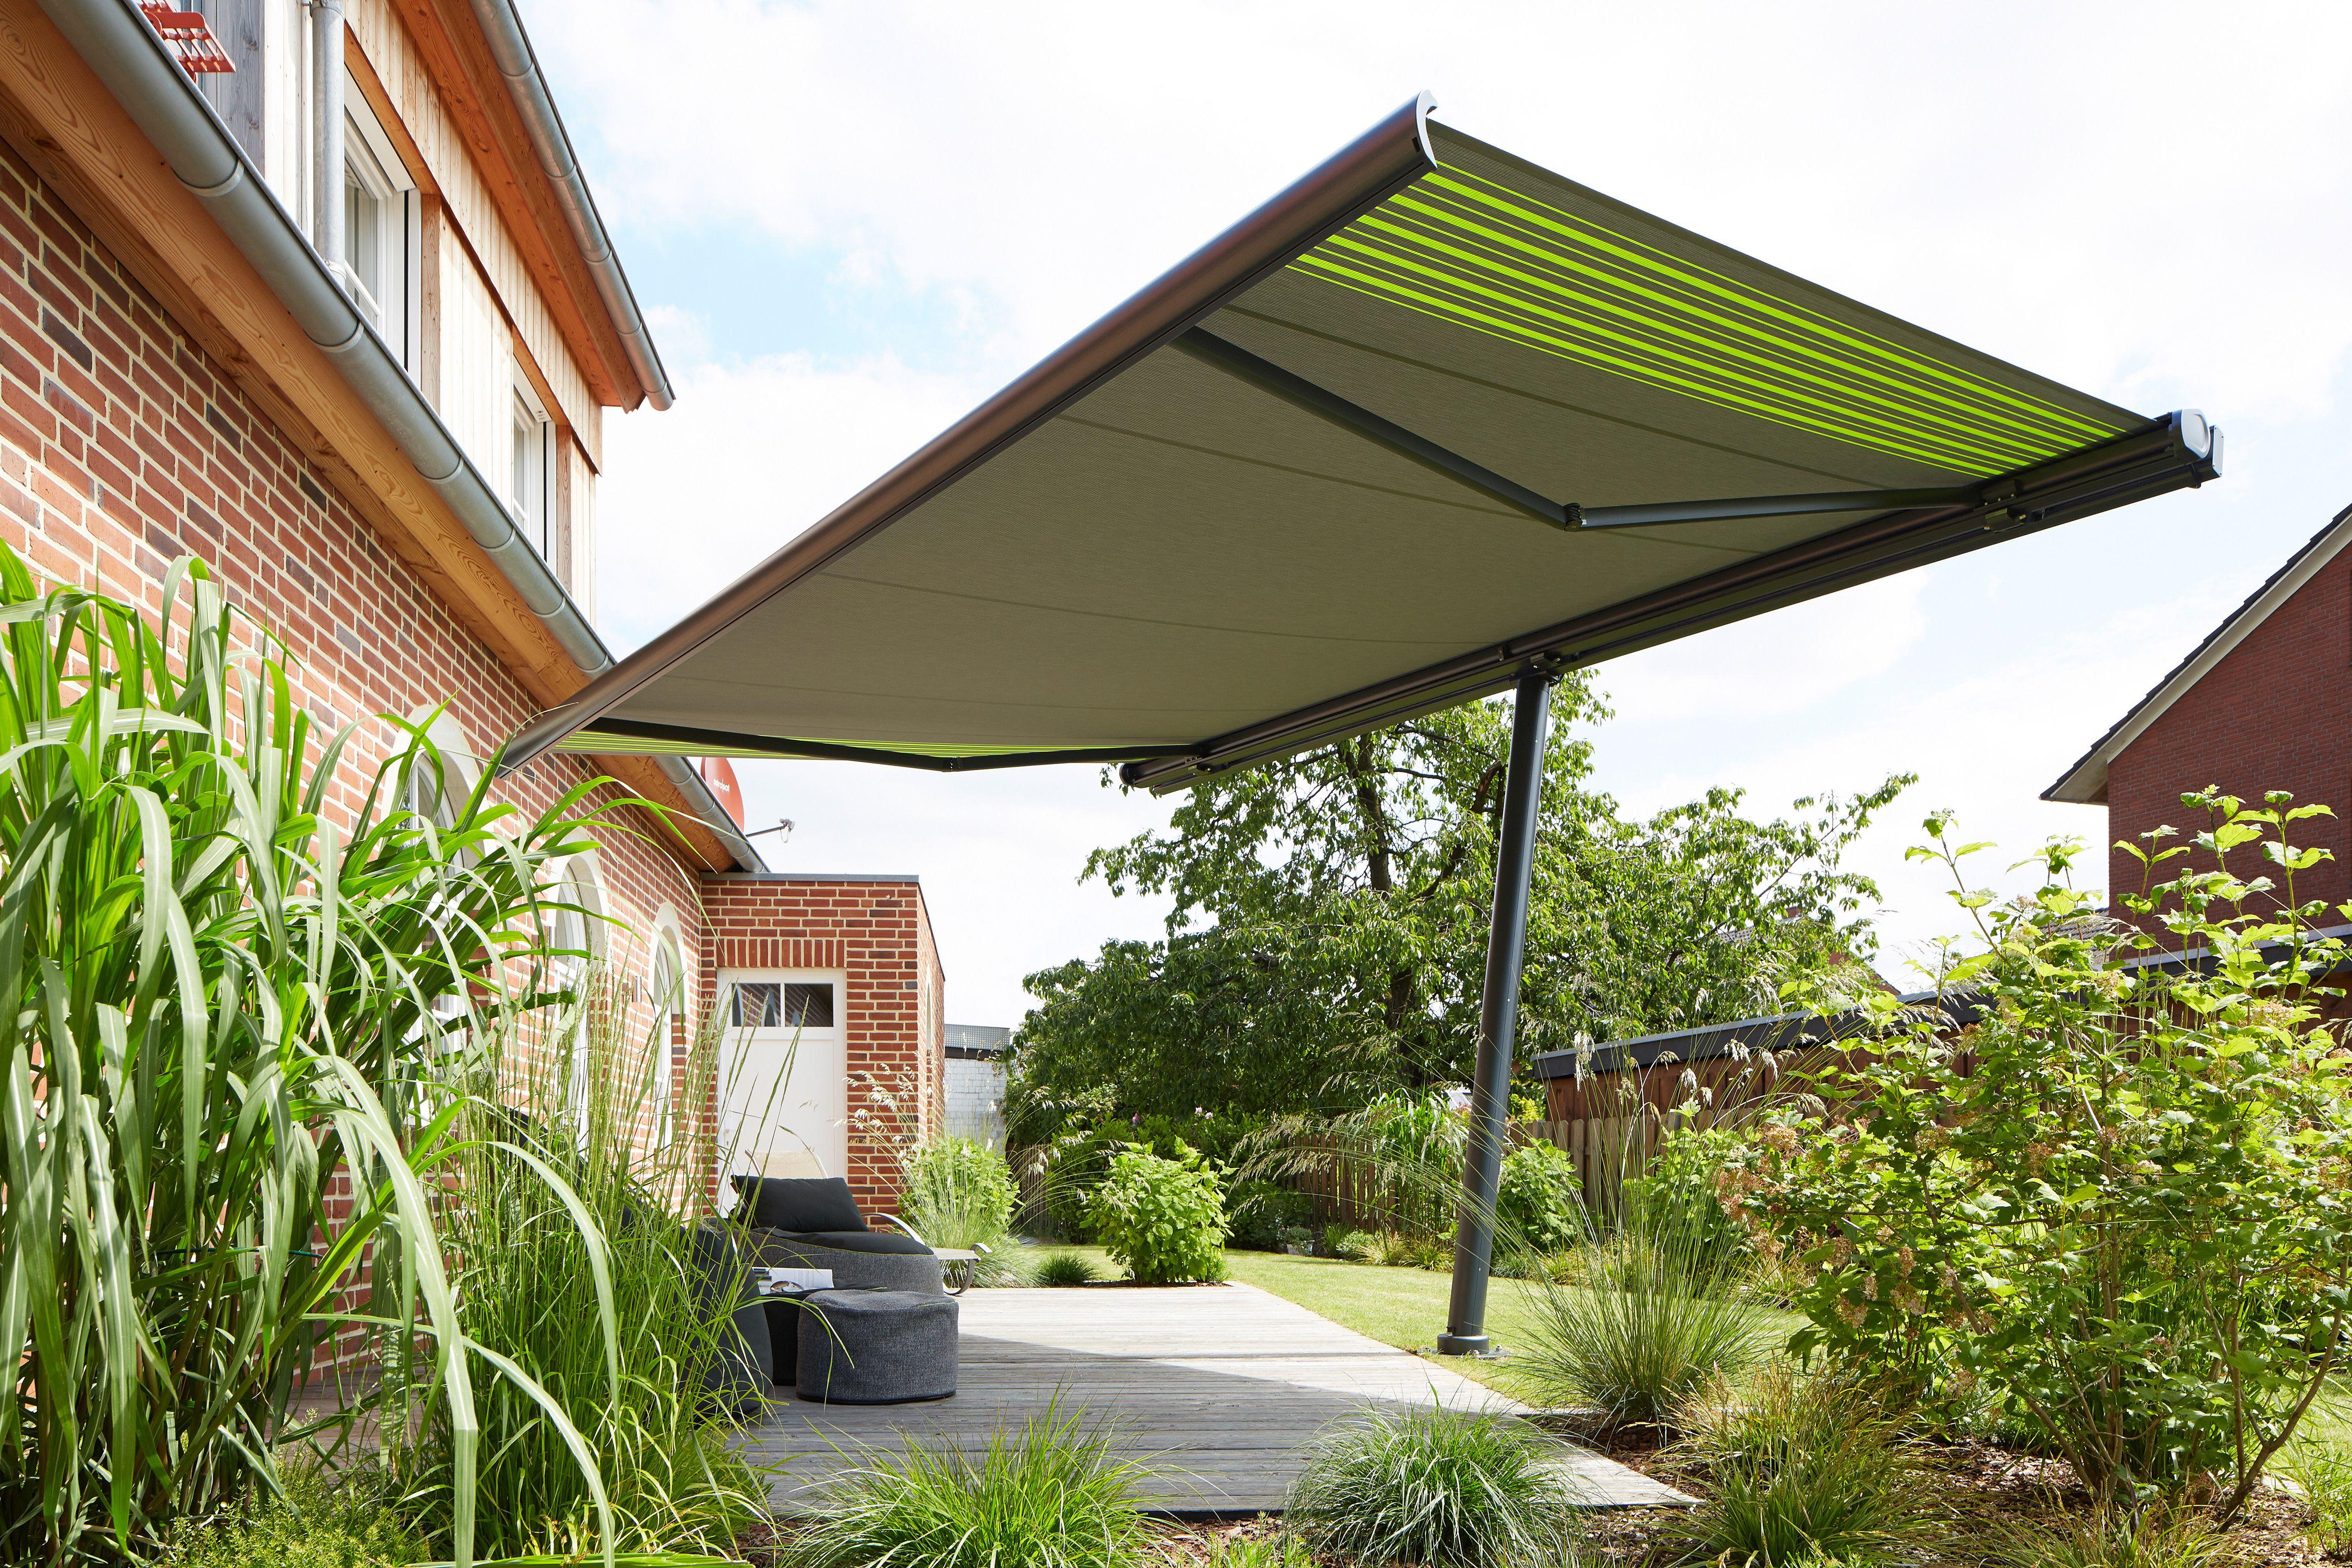 sonnendach terrasse sonnensegel shangrila geschlossen. Black Bedroom Furniture Sets. Home Design Ideas